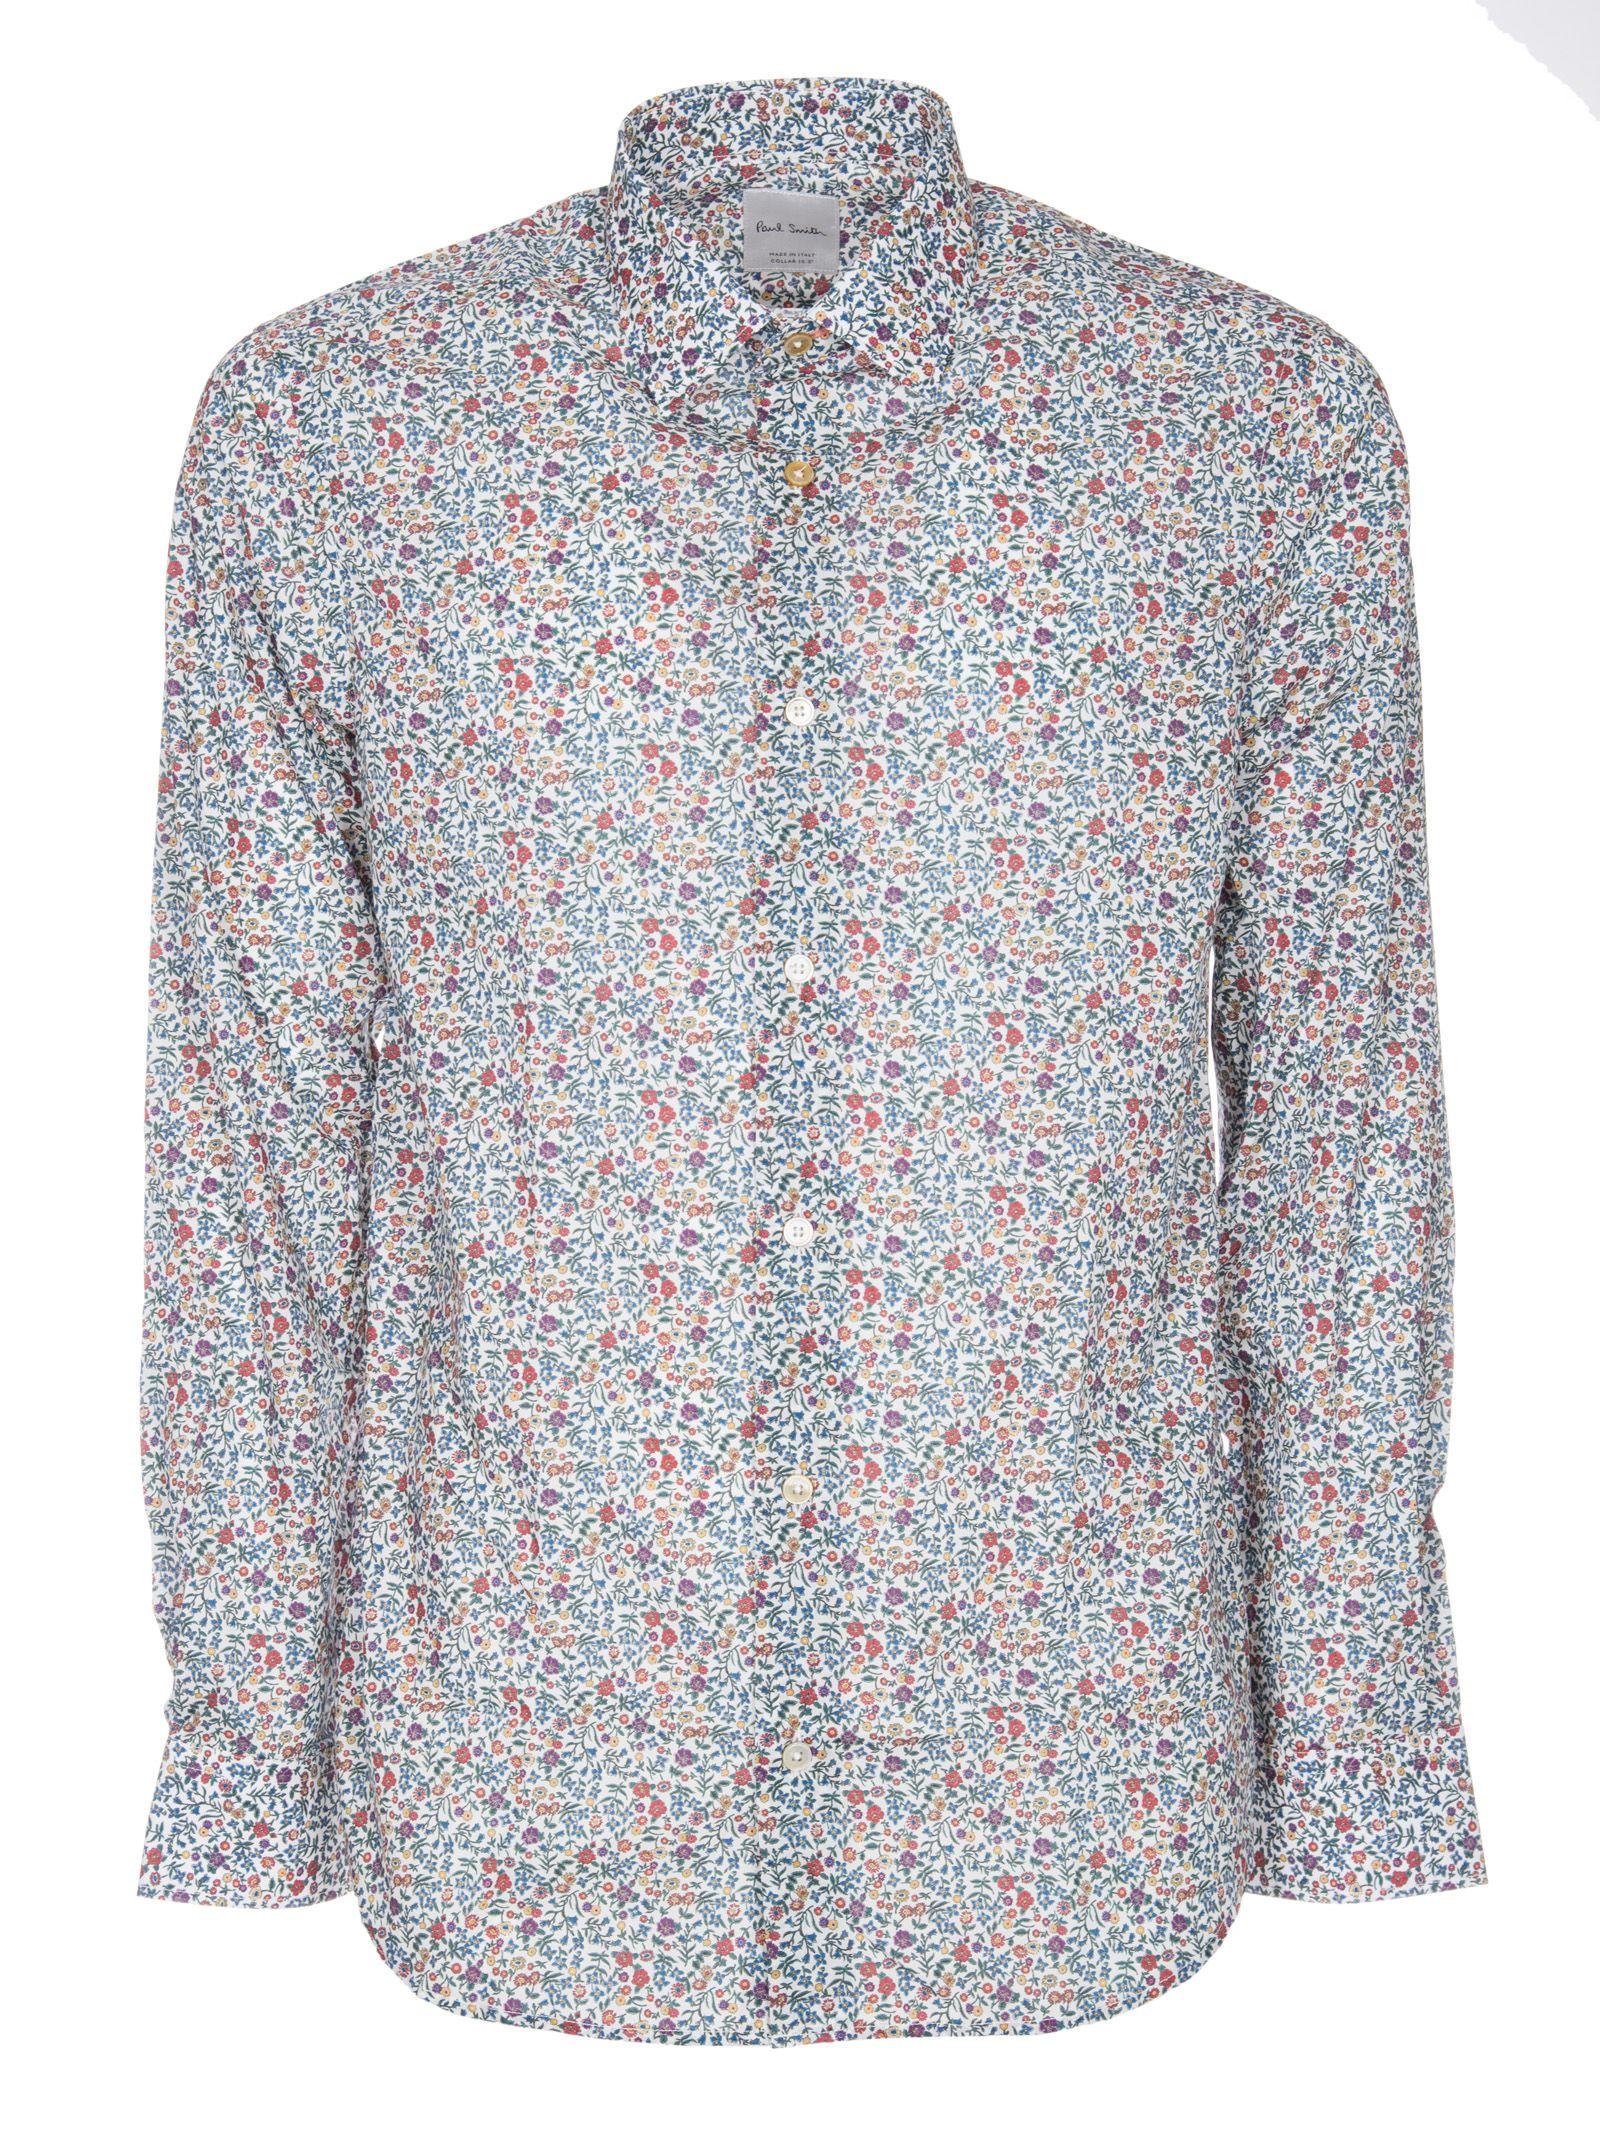 Paul Smith Bird Floral Shirt